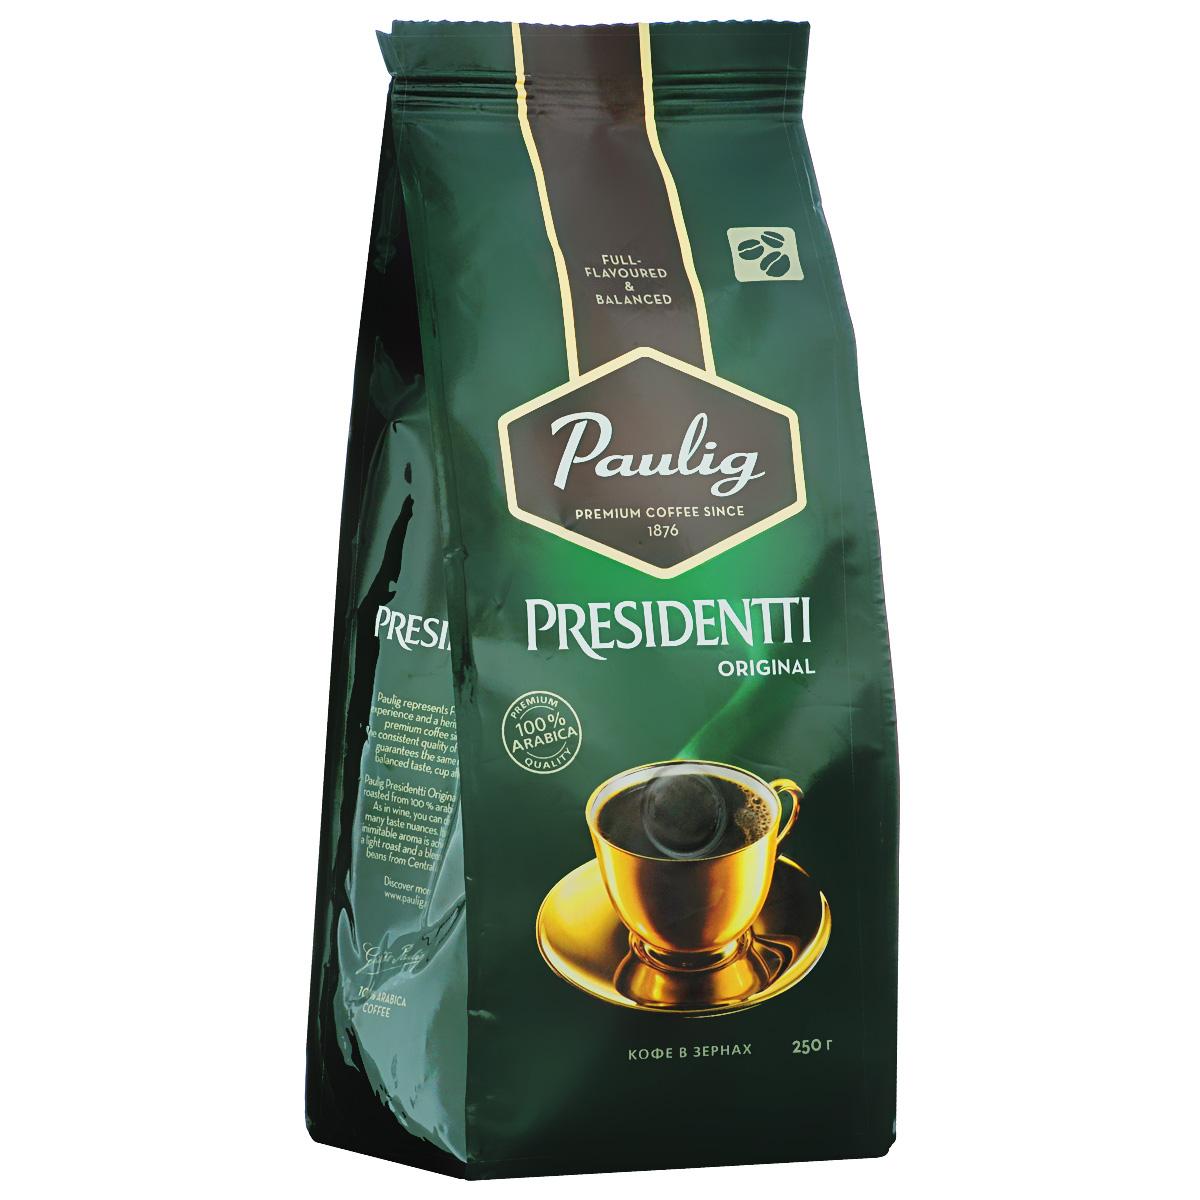 Paulig Presidentti Original кофе в зернах, 250 г